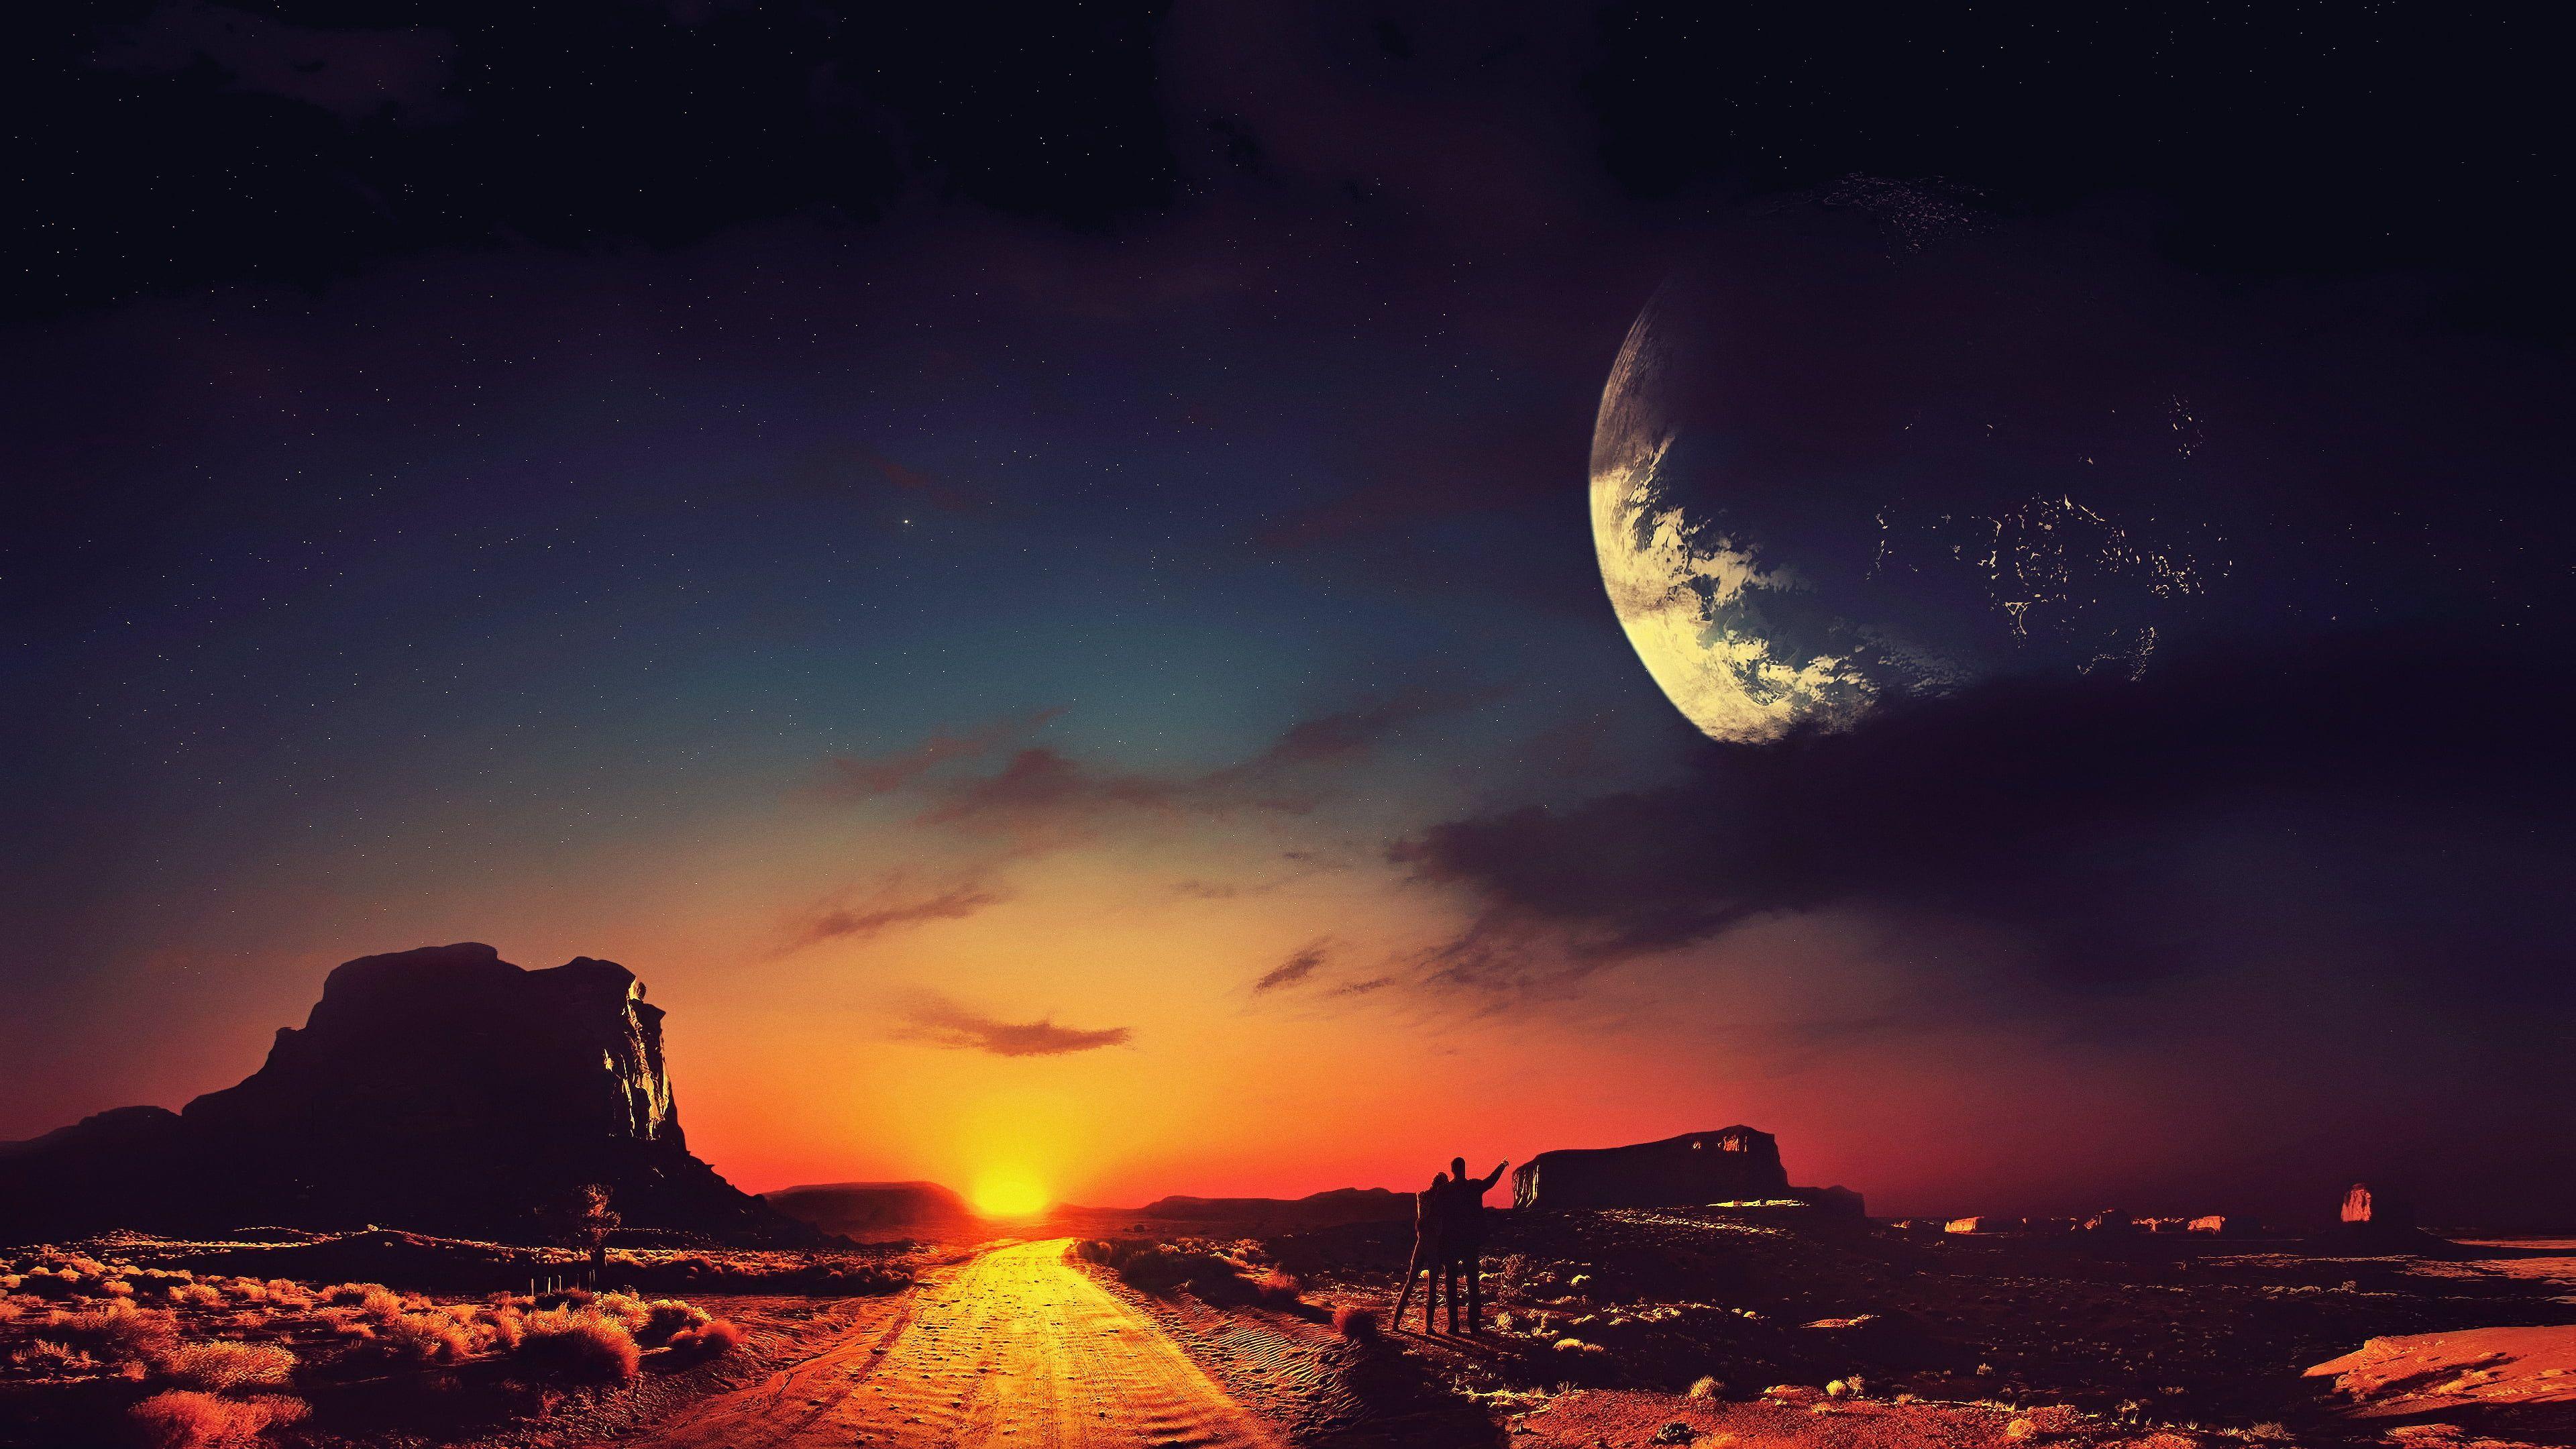 Science Fiction Concept Art Stars Landscape Space Digital Art Dark Fantasy Art Artwork 4k Wallpaper Hdwallpaper Desktop V 2020 G